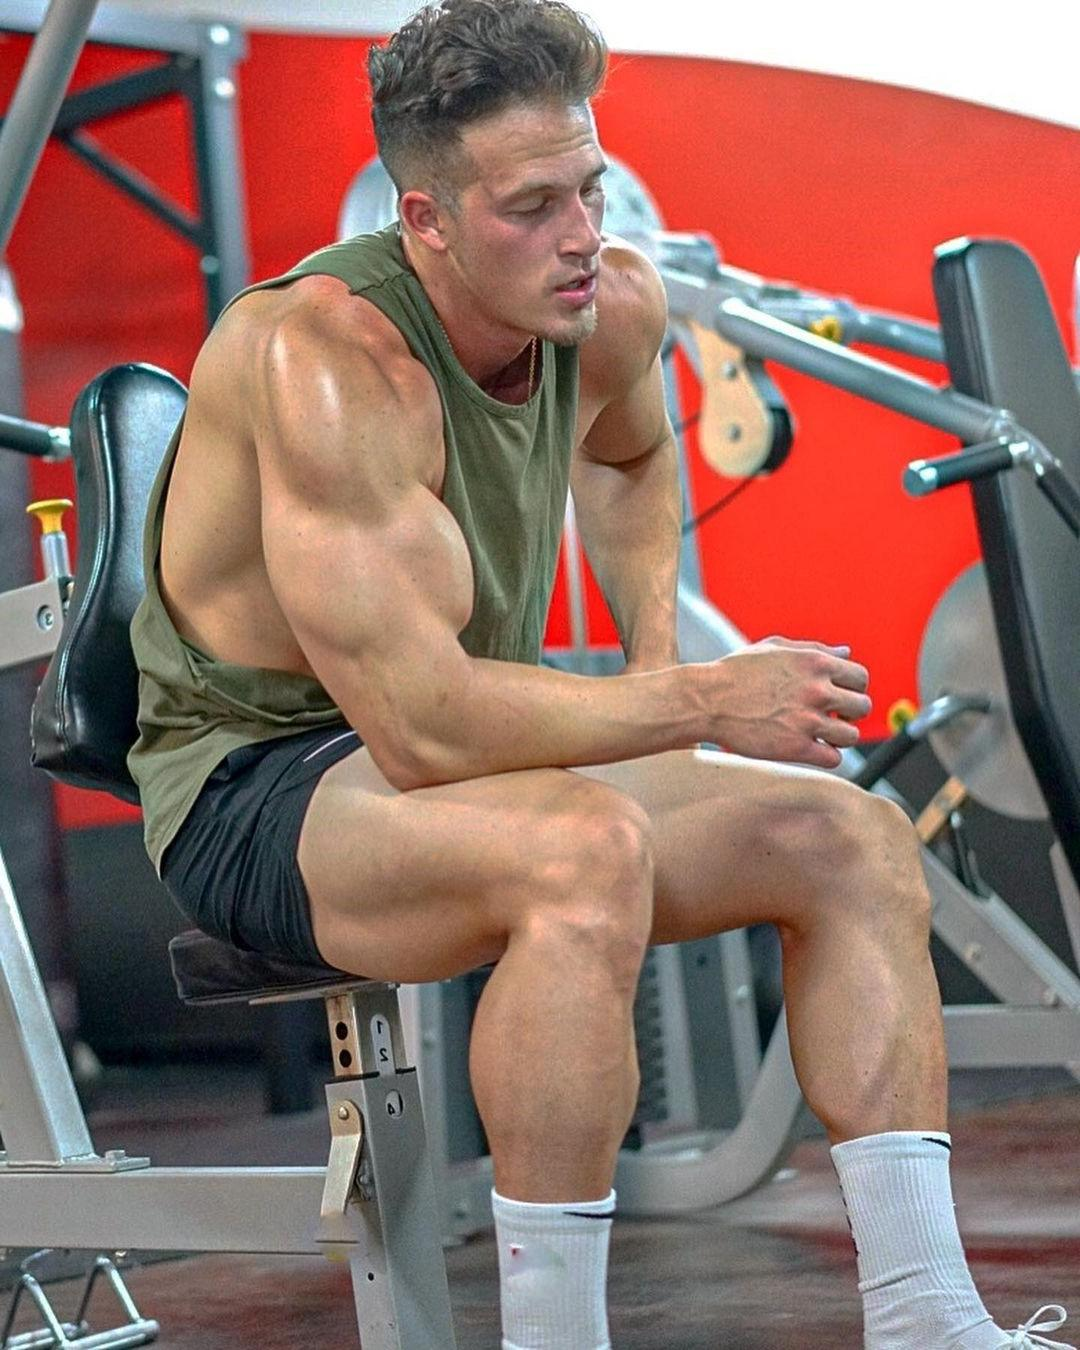 fit-sweaty-gym-hunks-brandon-anthony-flihan-big-biceps